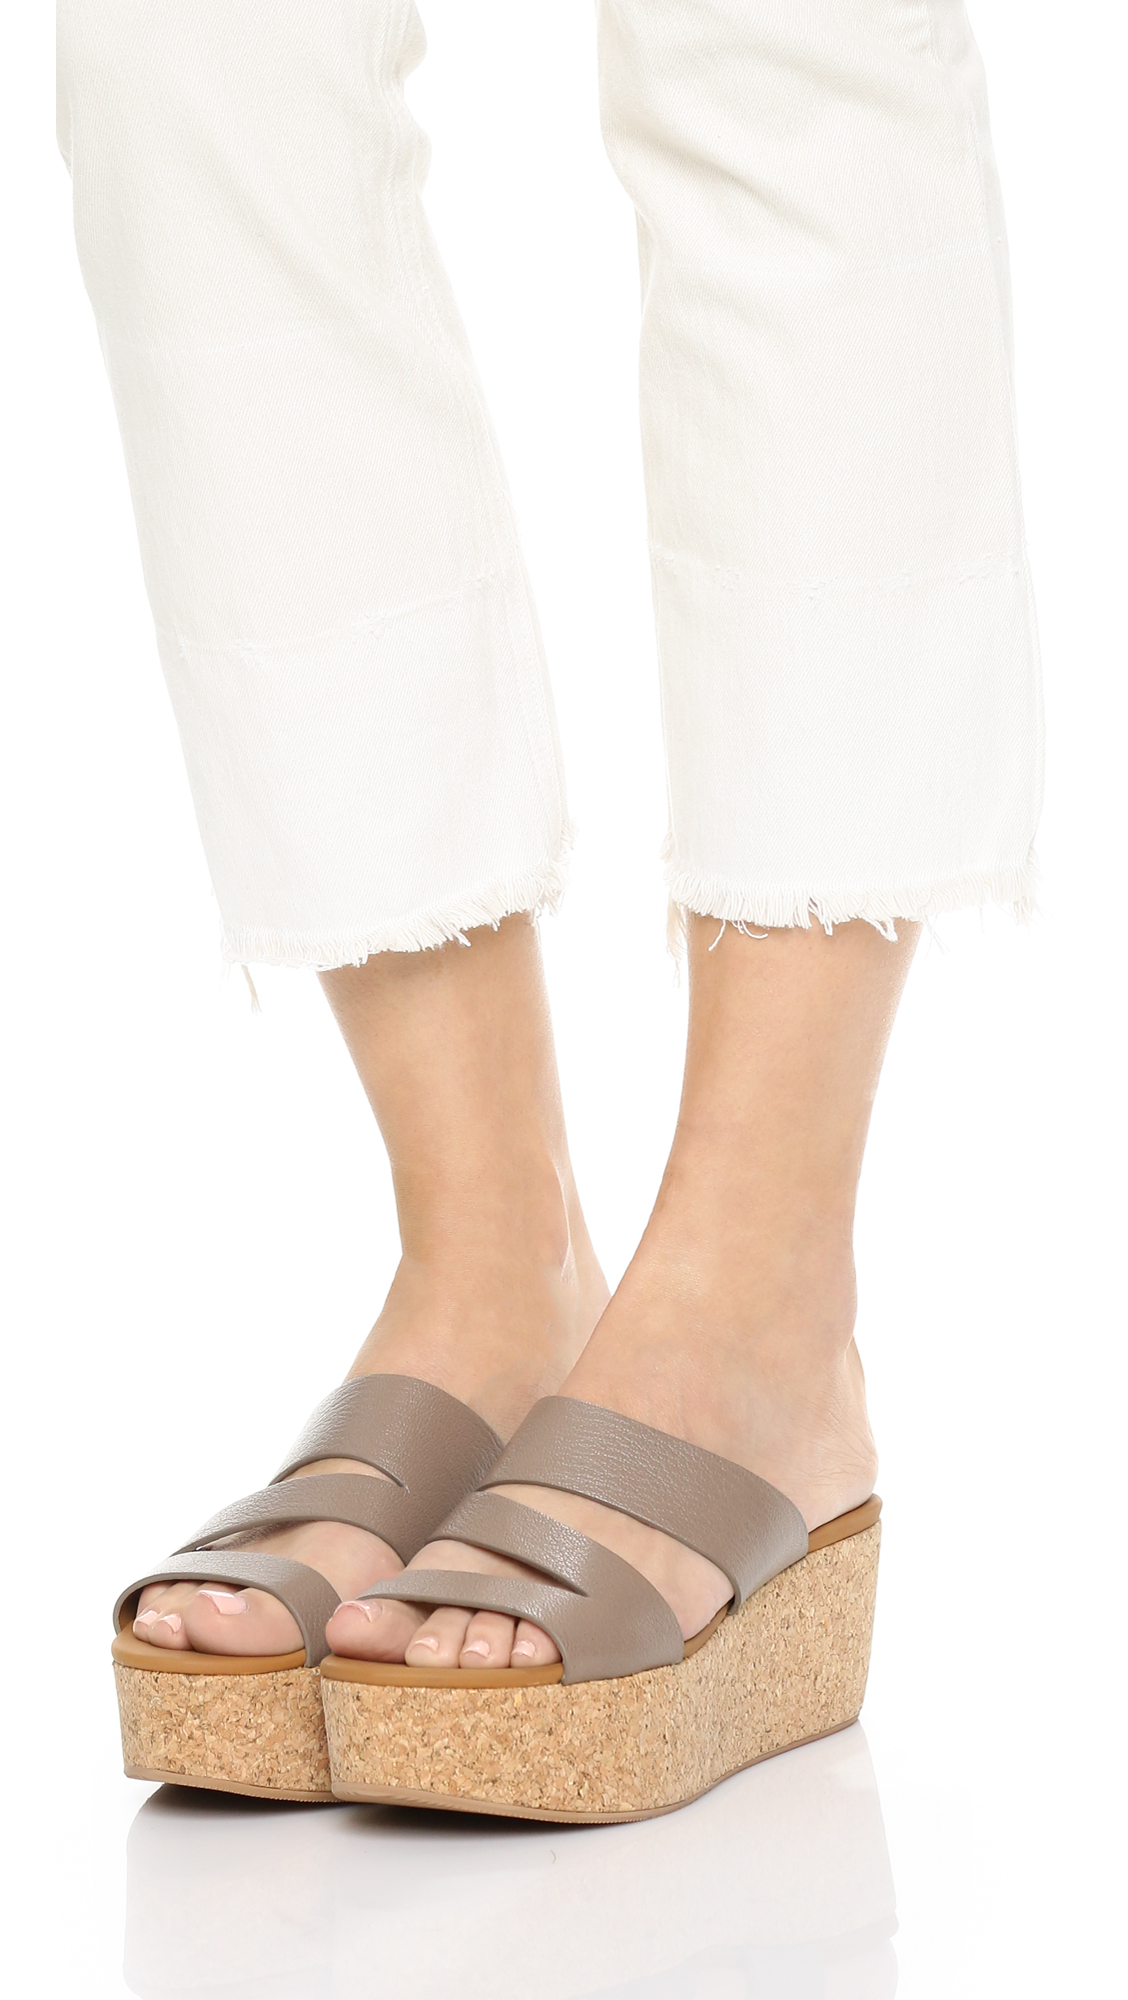 Platform By Chloe See Wedge SandalsShopbop Dania GqSUzpMVL